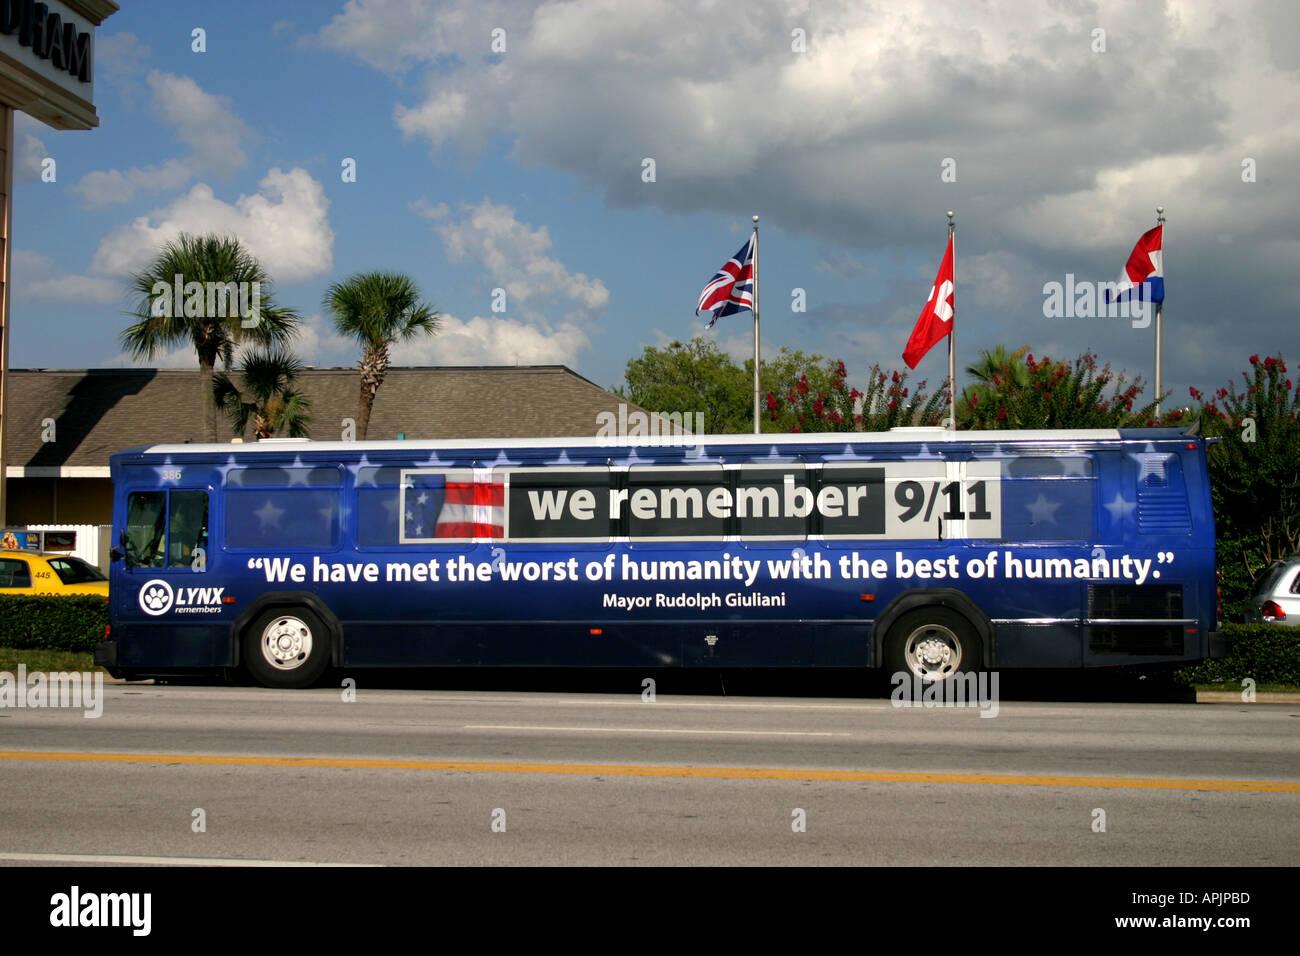 9 11 Bus on International Drive Orlando Florida United States of America - Stock Image